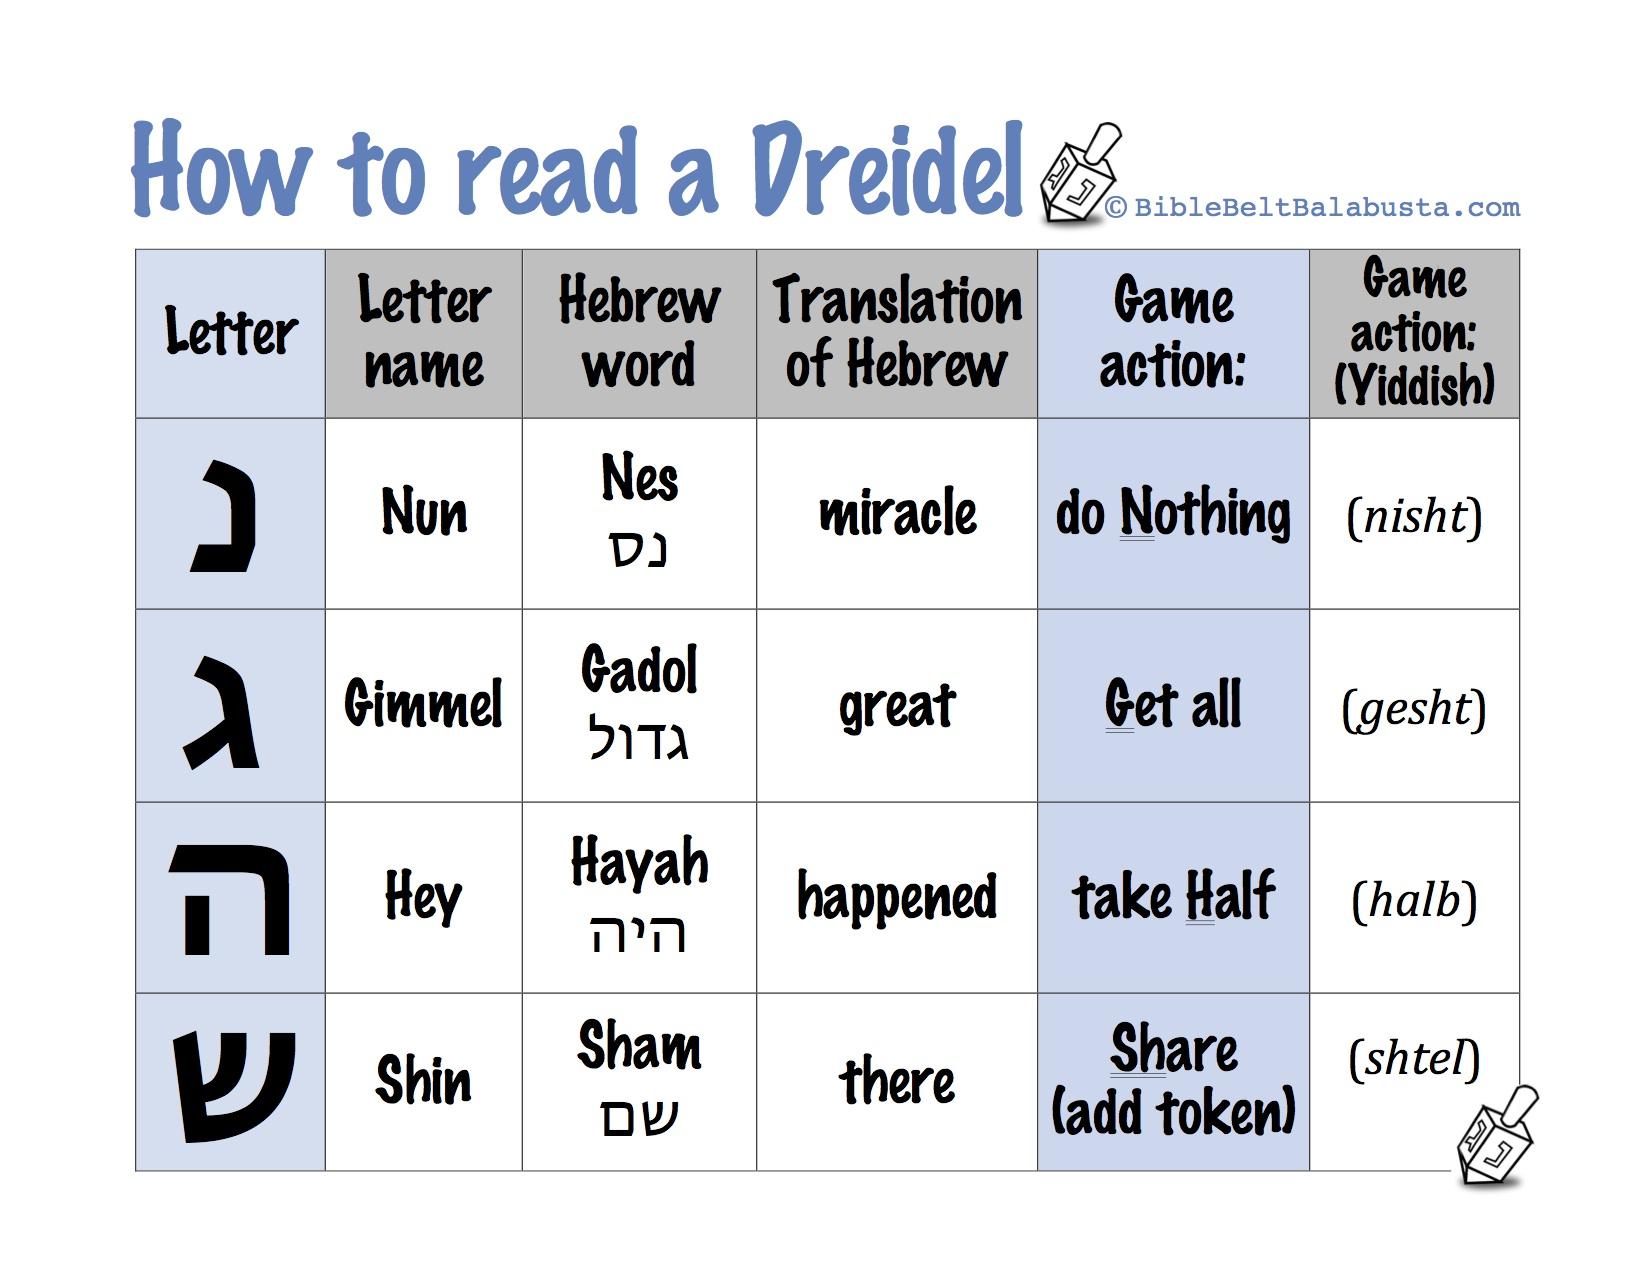 photograph regarding Dreidel Printable titled Printable Dreidel legislation, letter names and meanings Bible